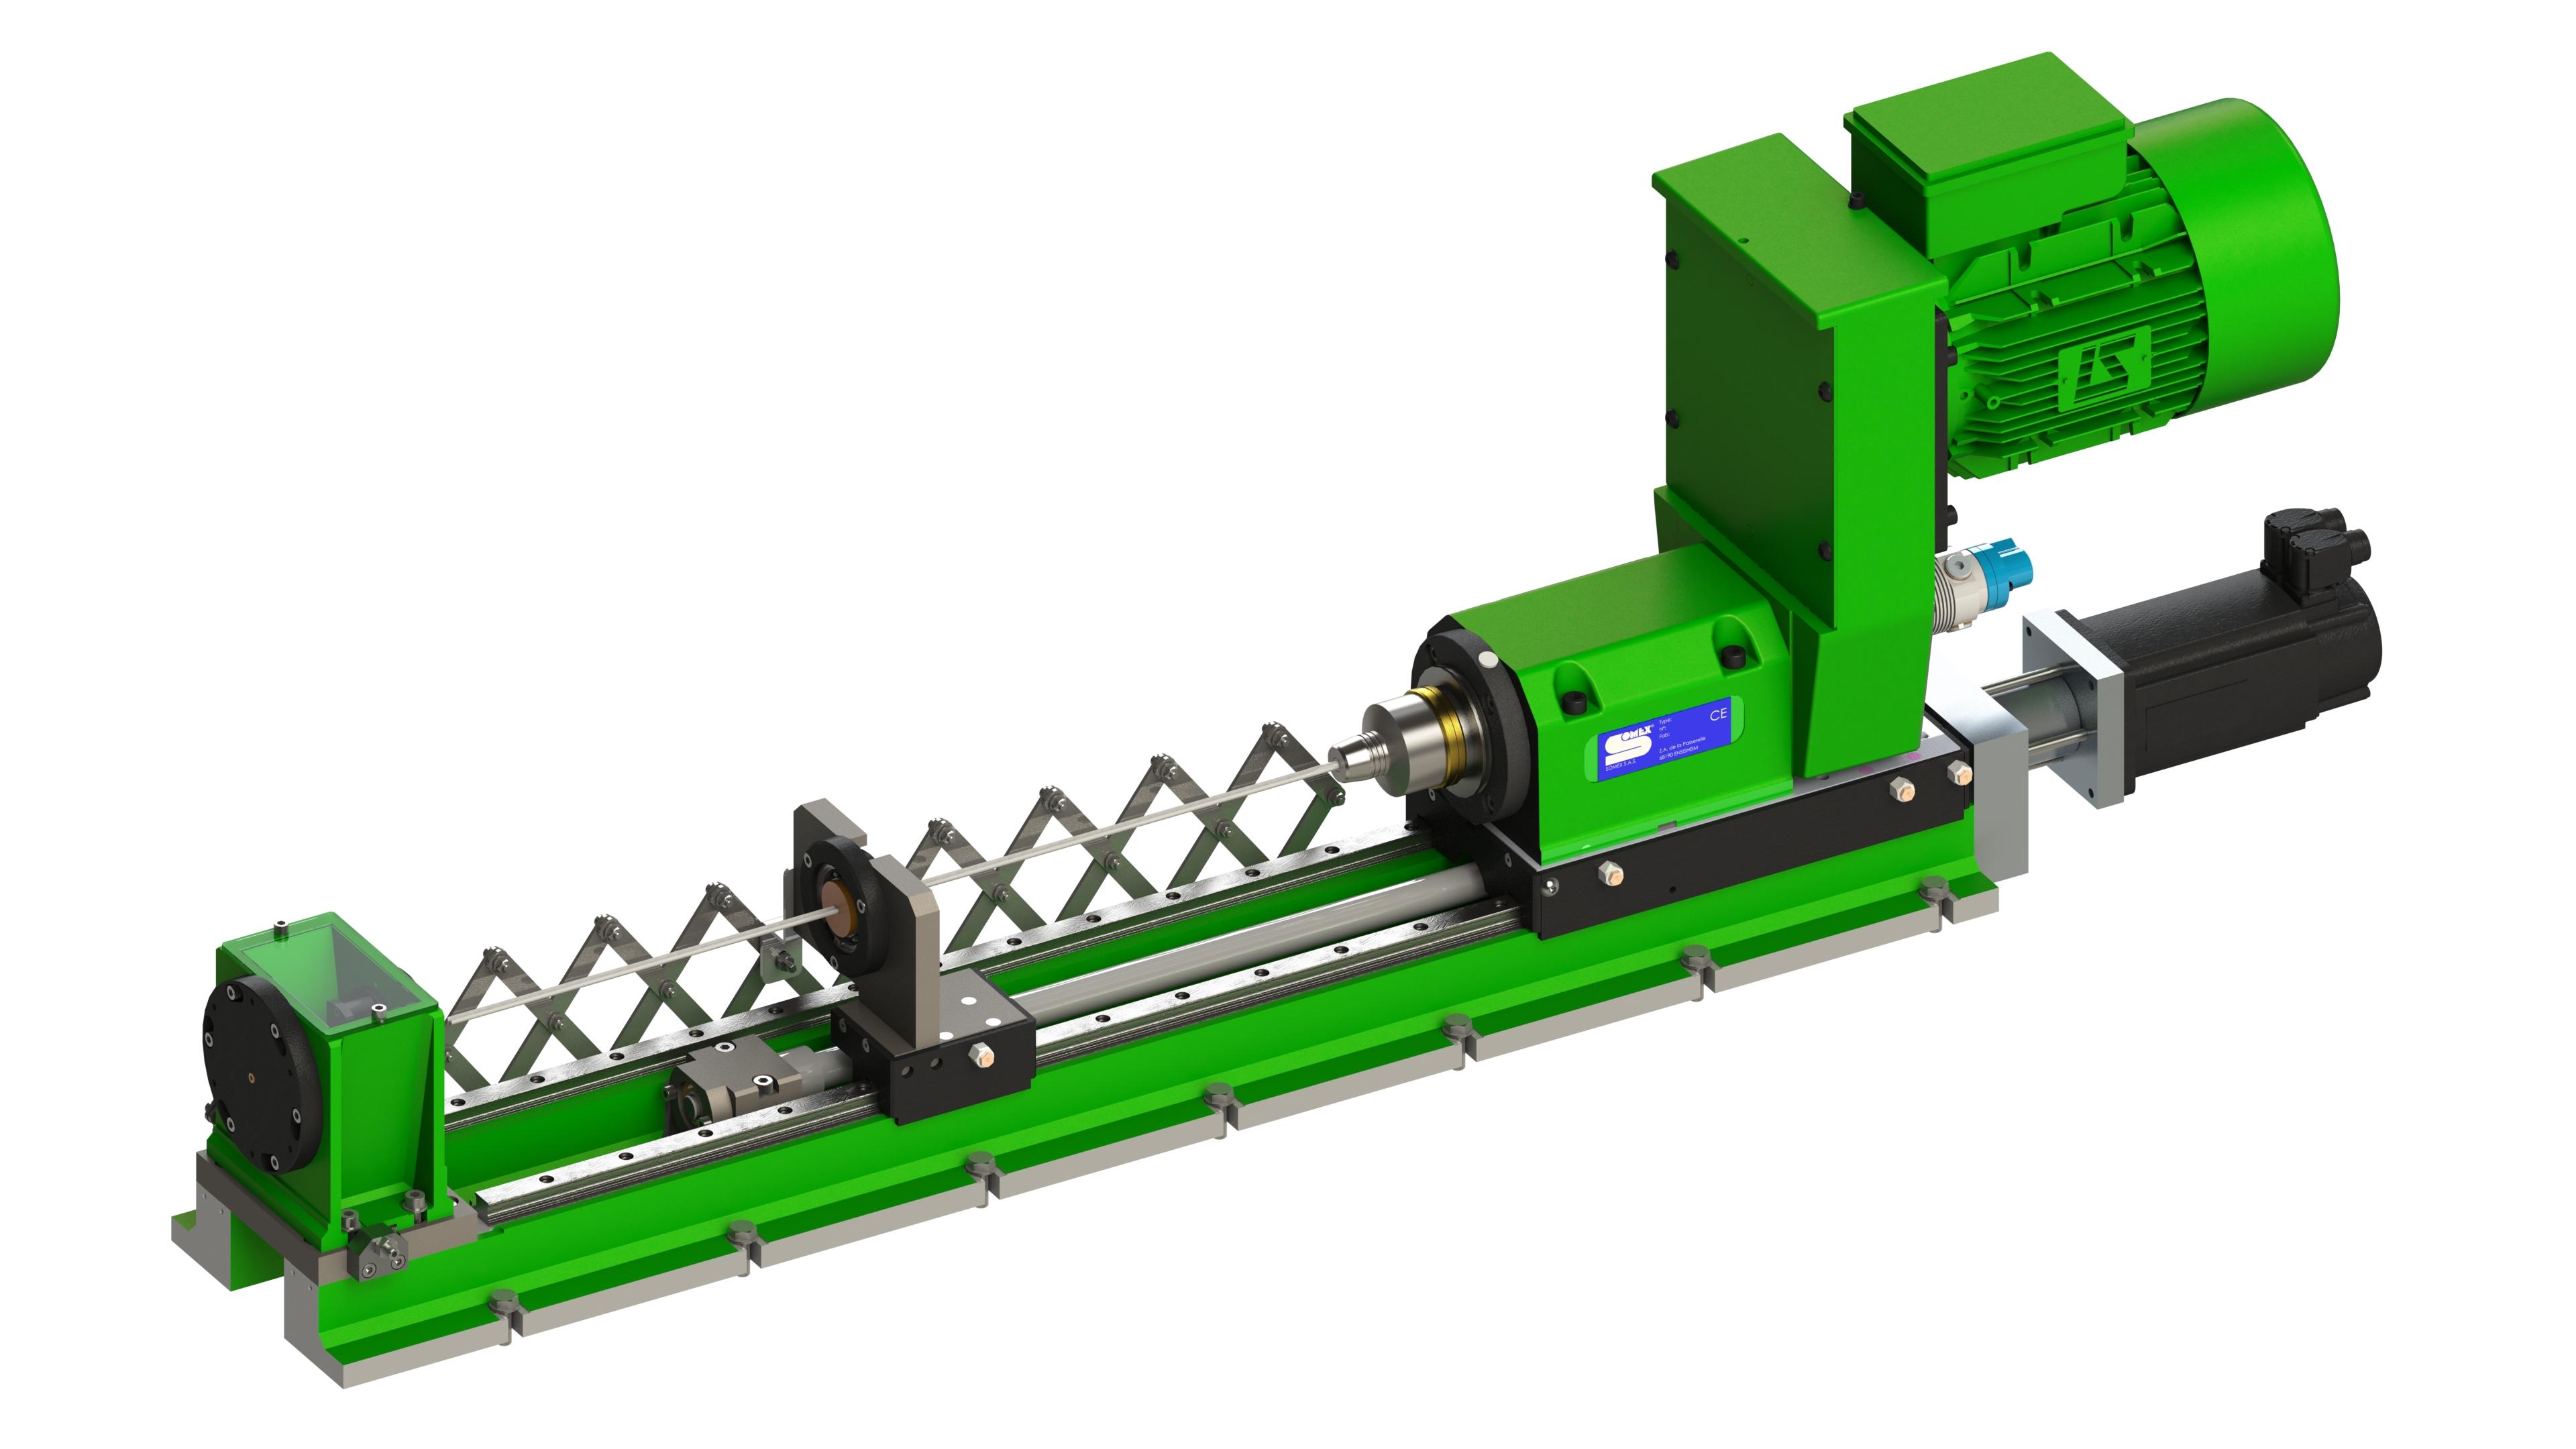 ECPP40-500 - Unité de perçage profond, capacité de perçage de Ø6 à Ø12 mm